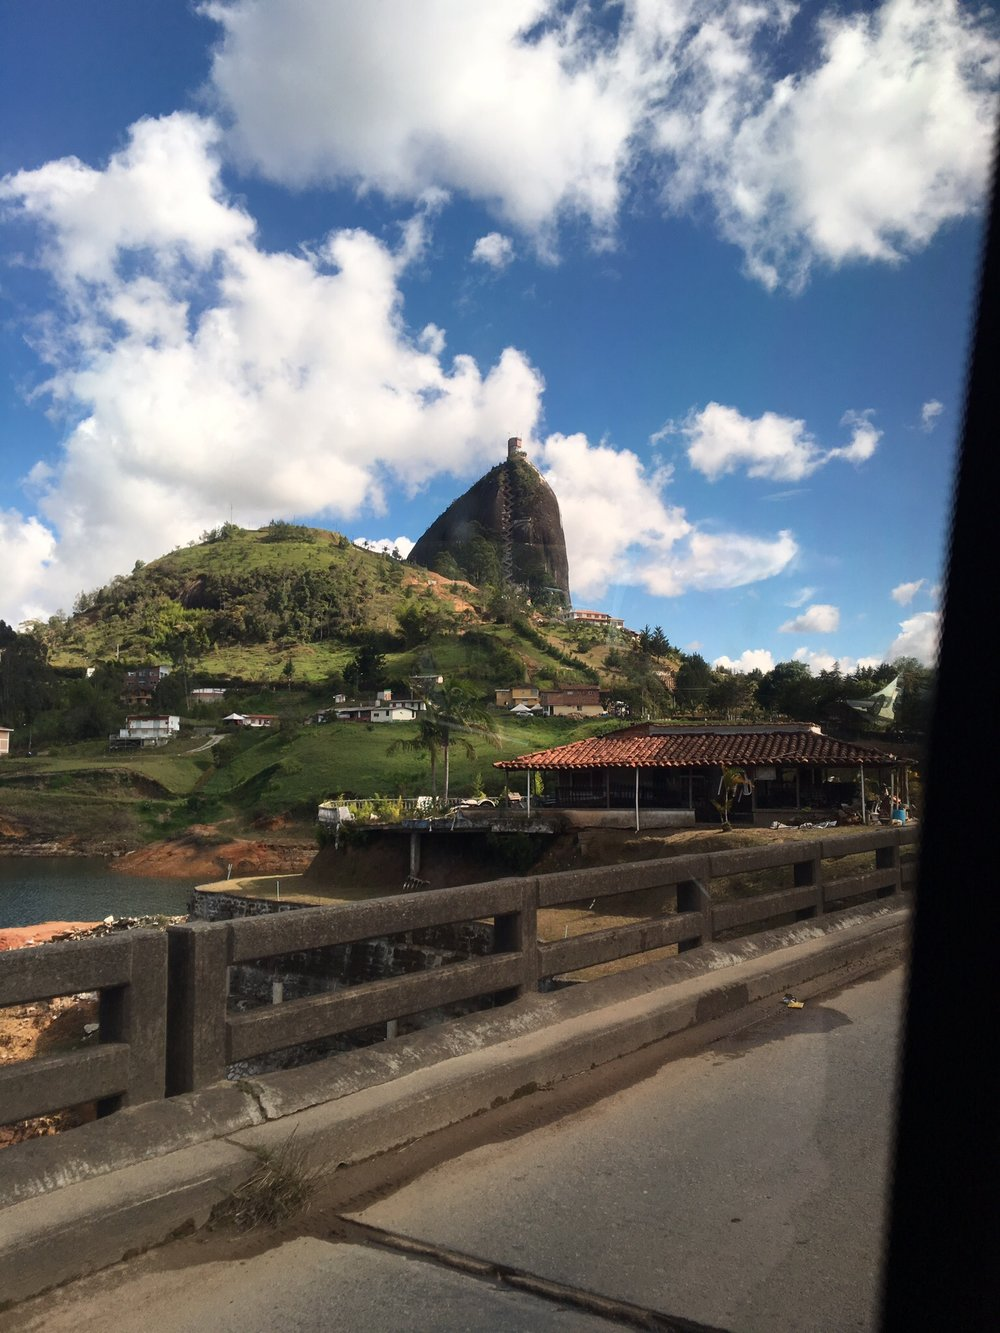 Approaching El Penon/The Rock.